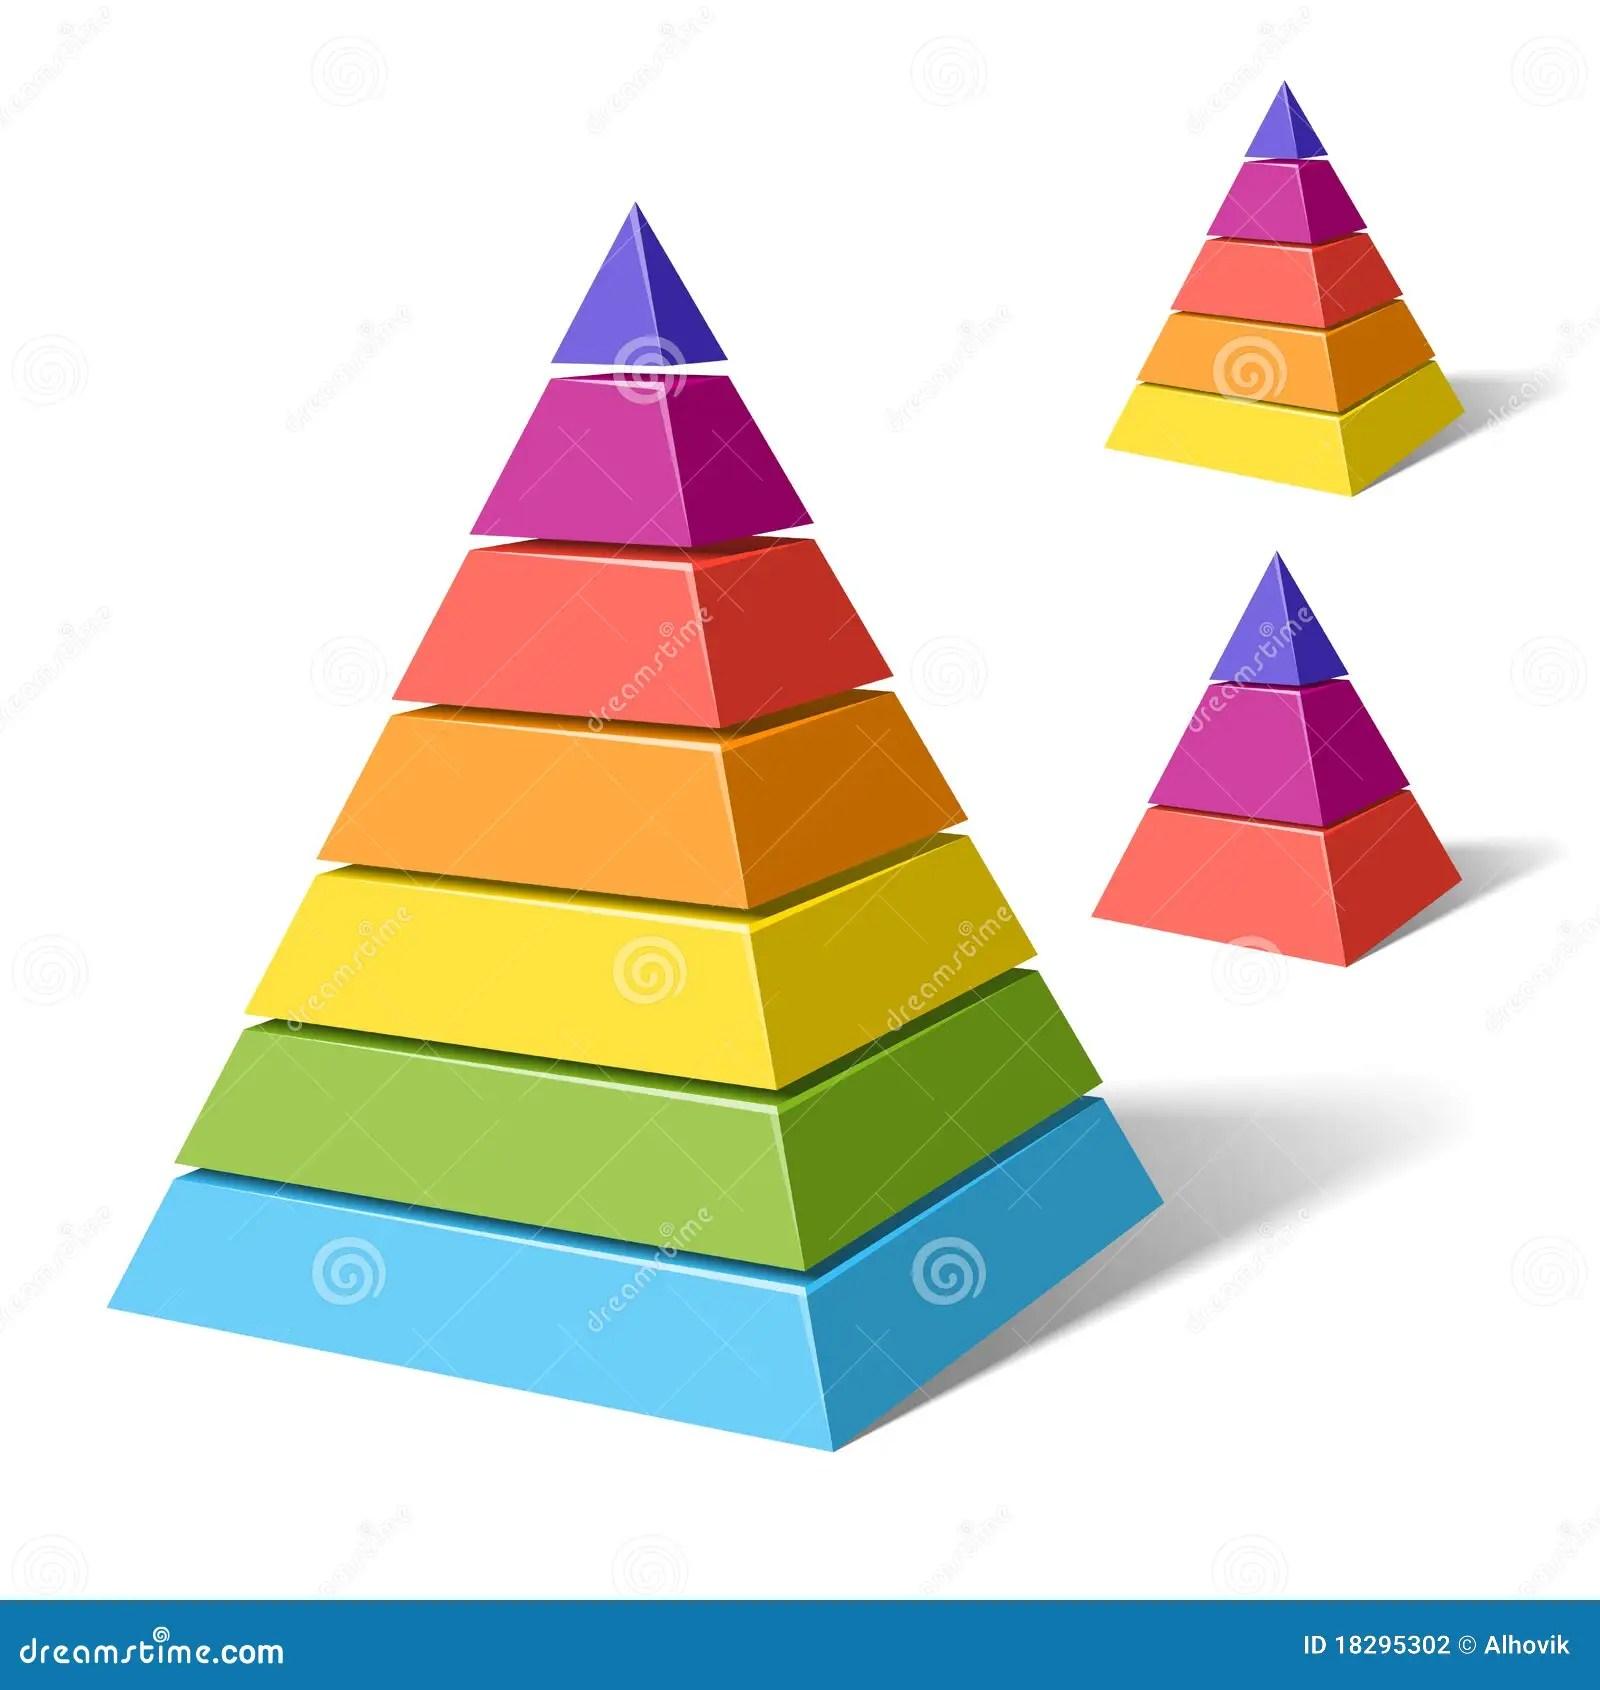 Layered Pyramids Stock Vector Illustration Of Reflection